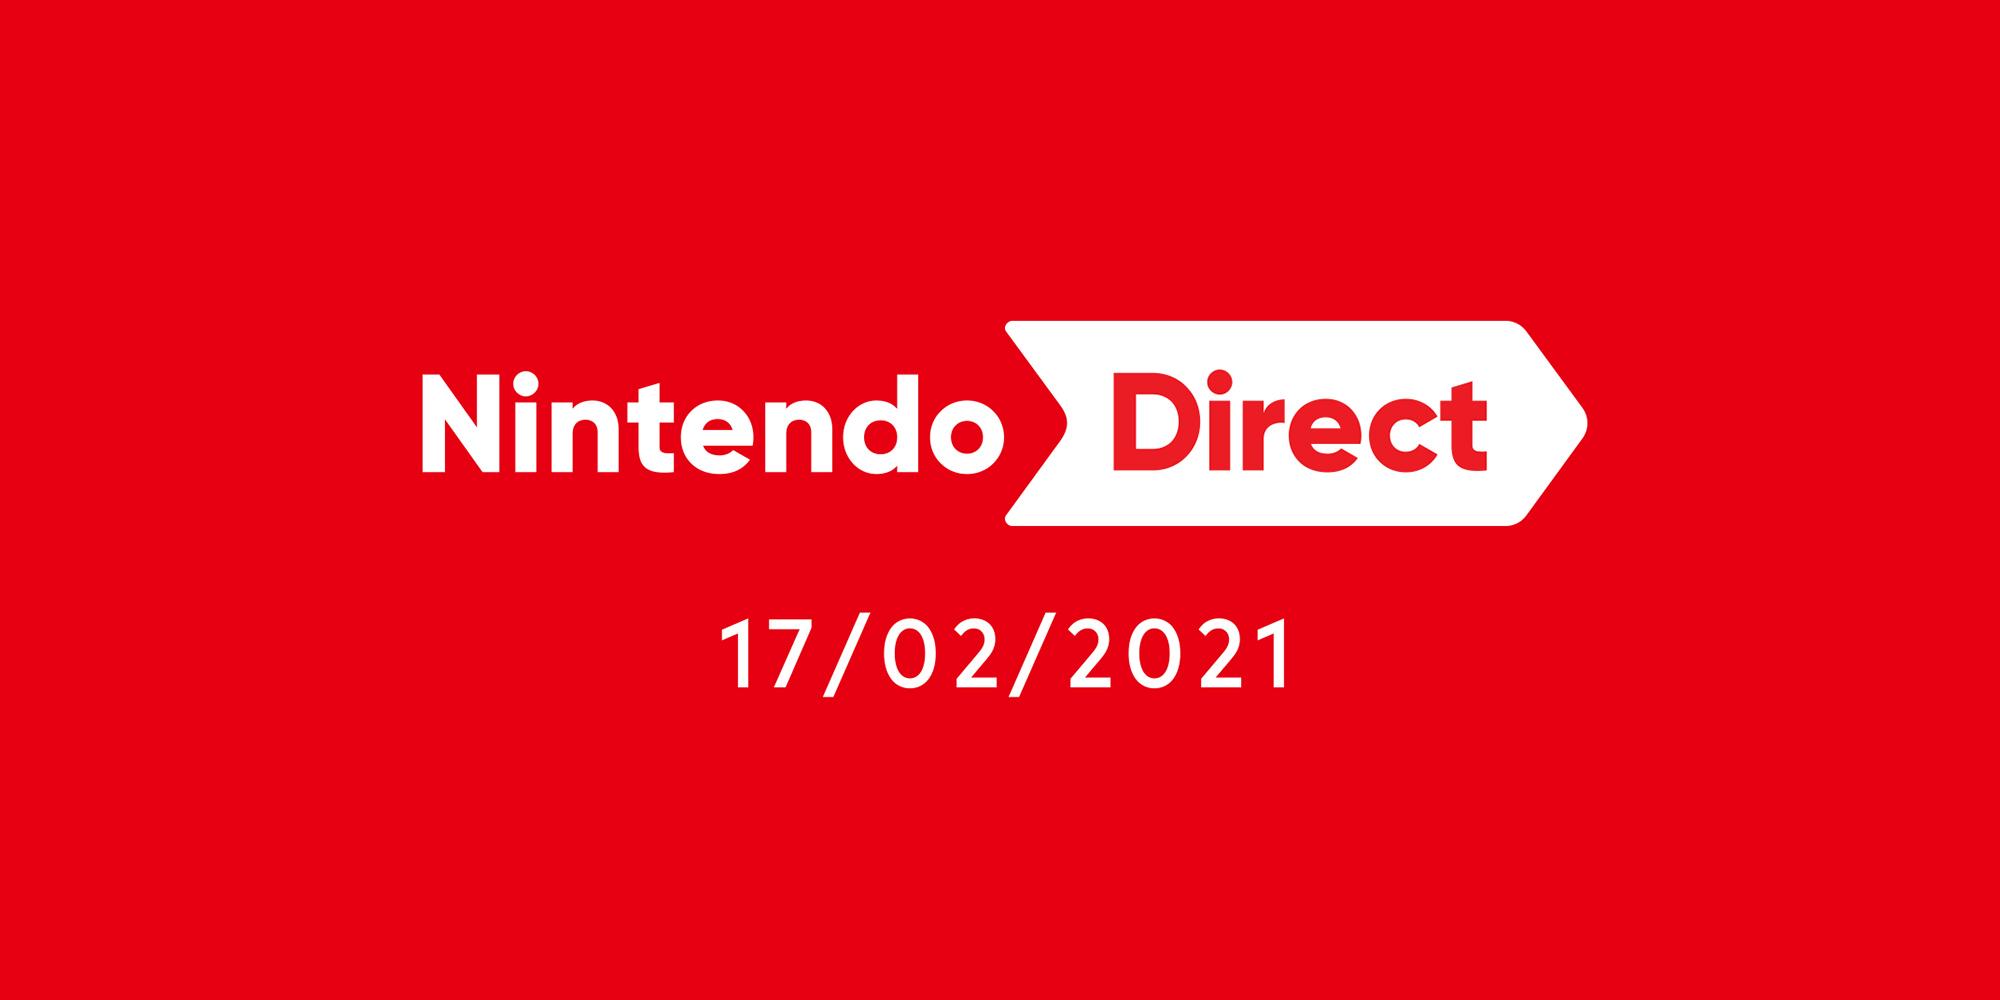 Nintendo Direct 17-02-2021 cover